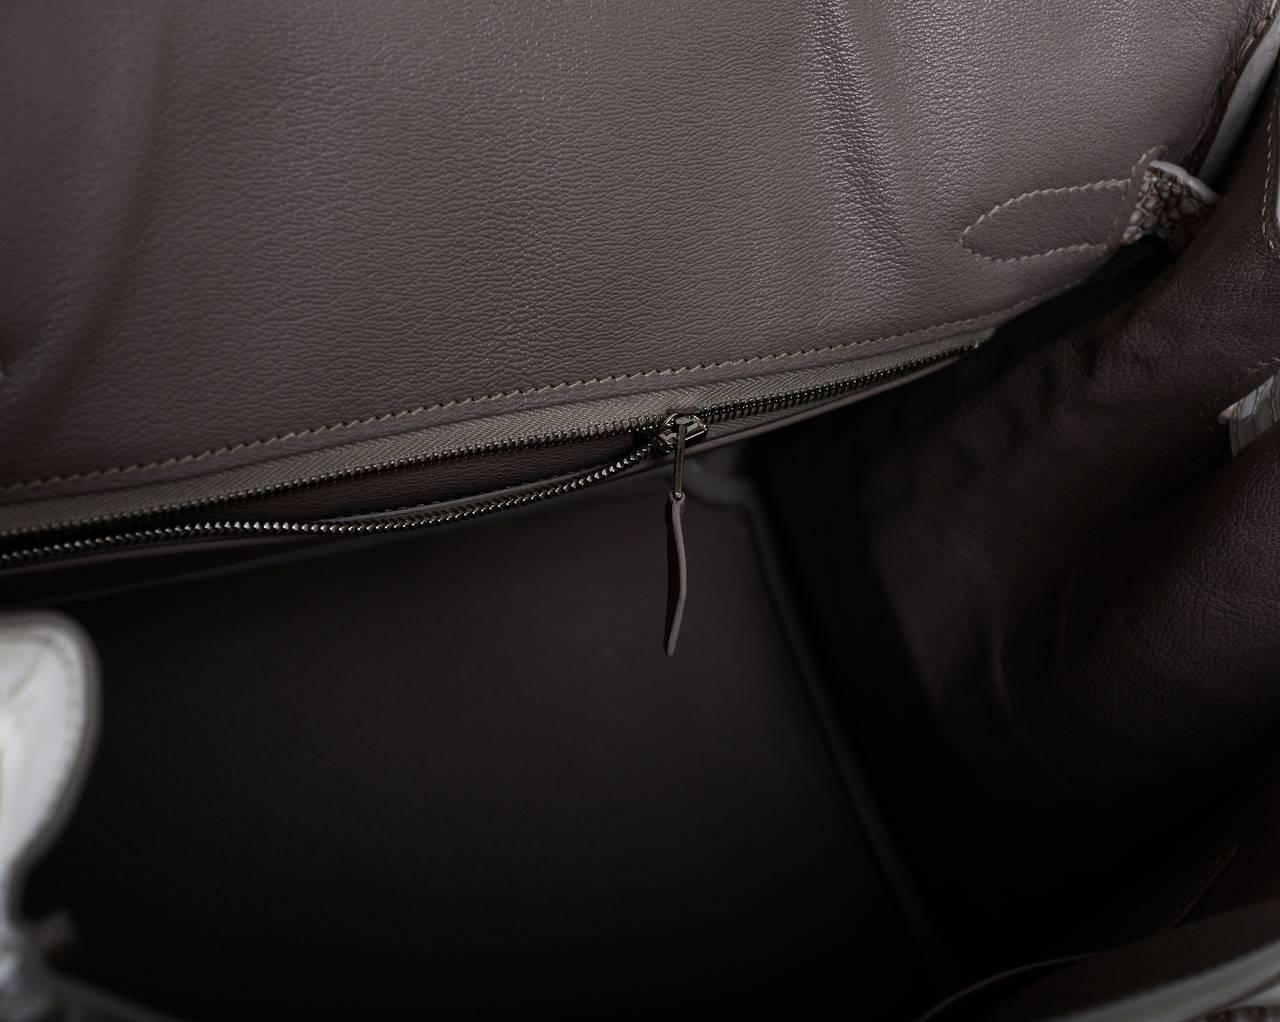 replica hermes kelly bag - HERMES BIRKIN BAG 25cm HIMALAYAN WHITE NILO CROCODILE JaneFinds ...